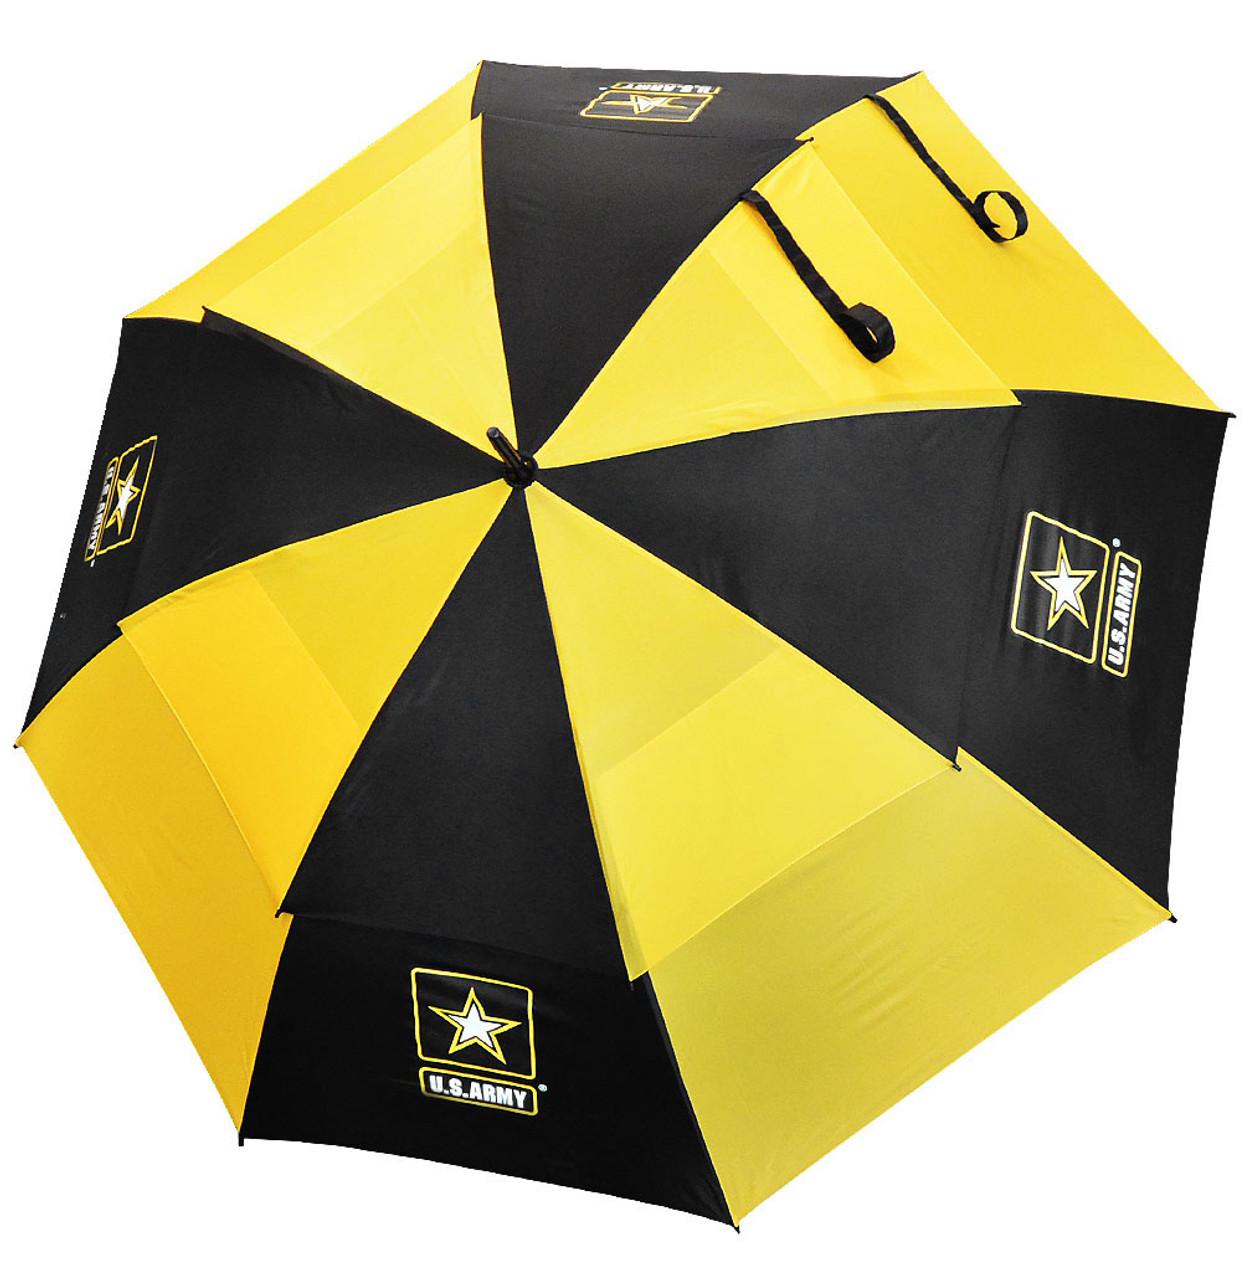 Hot z golf 62 double canopy military golf umbrella army for Canopy umbrella